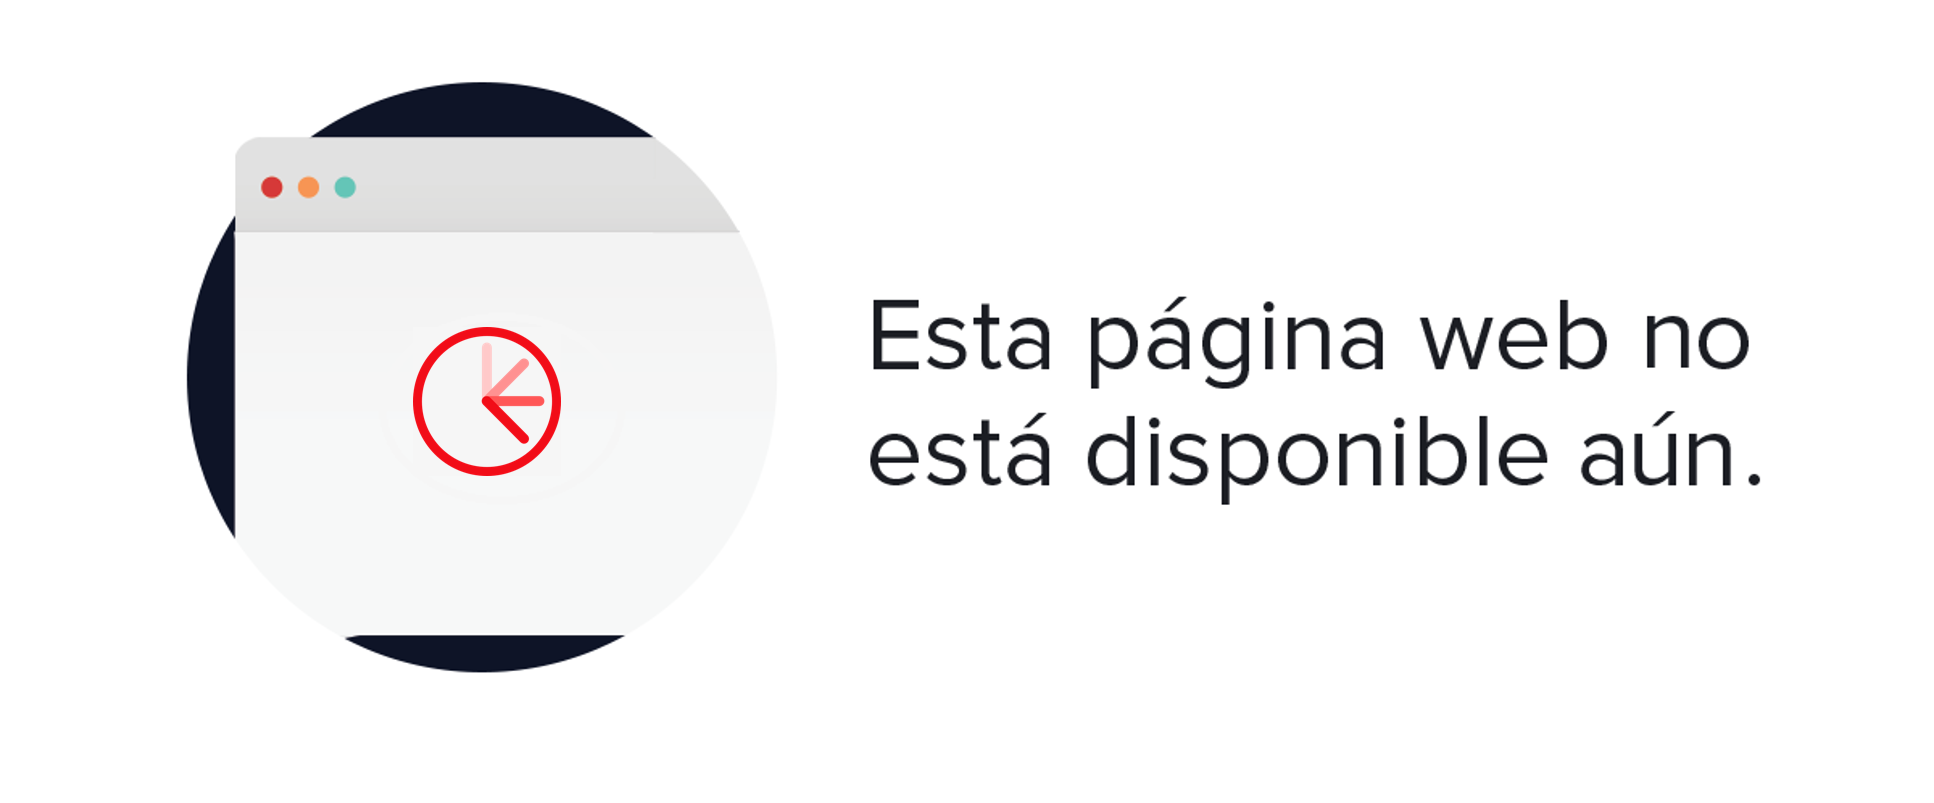 Nuevo : Christian Pellizzari - botines con hebilla ID de la Marca:56A20149980 - XHIXJPE - Botas Hombre